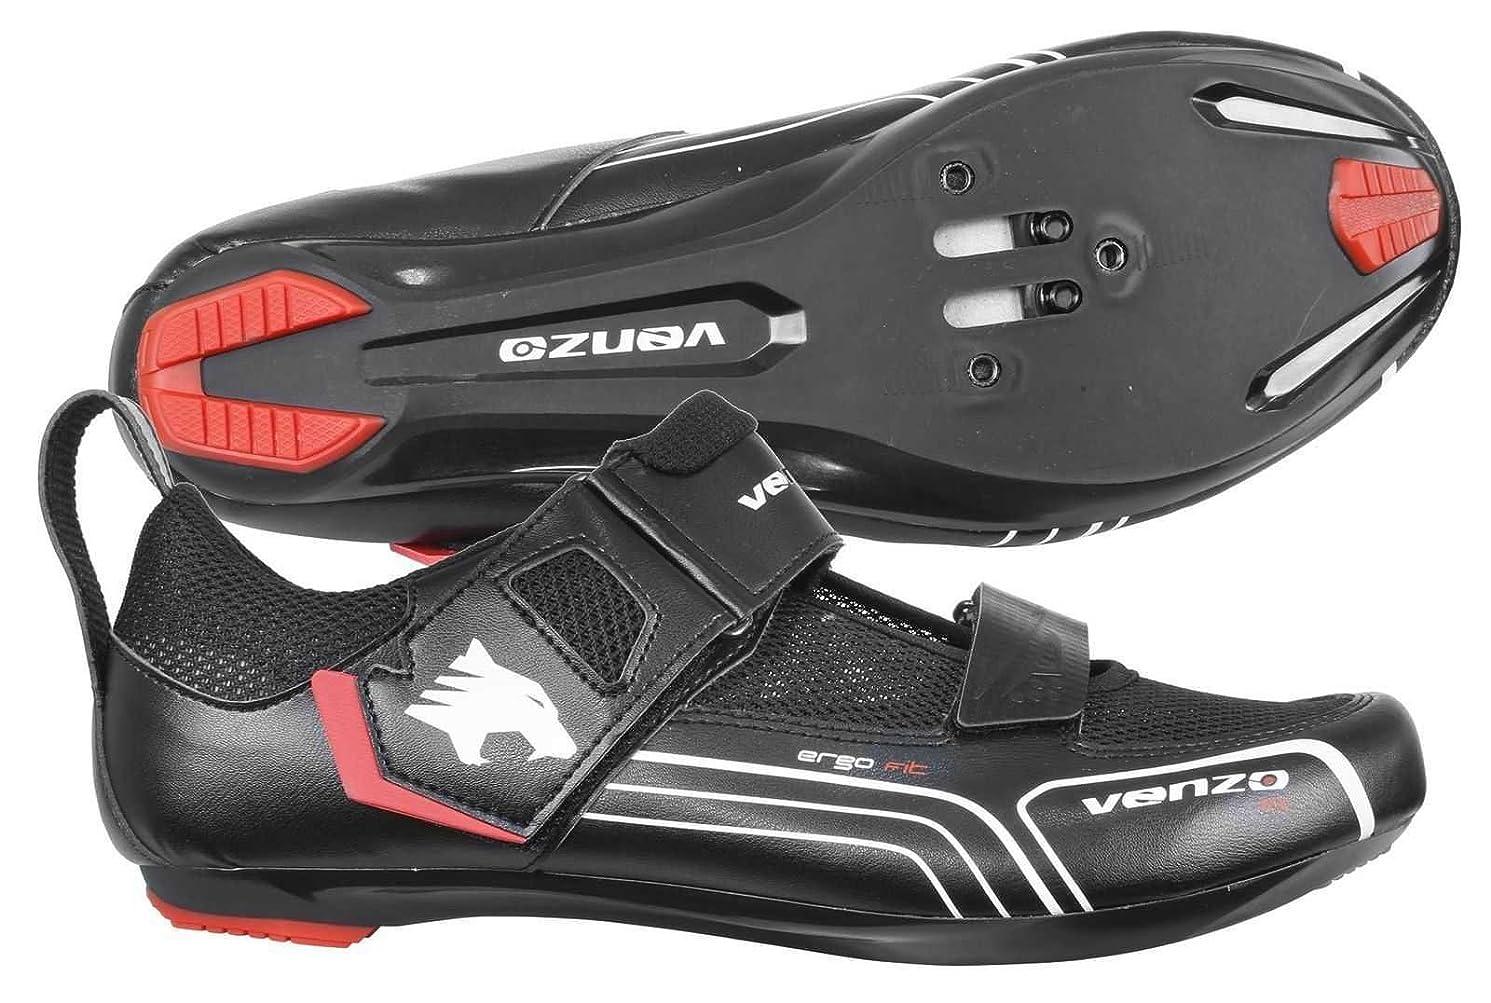 Venzo Bicycle Bike Cycling Triathlon Shoes for Shimano SPD SL Look Black